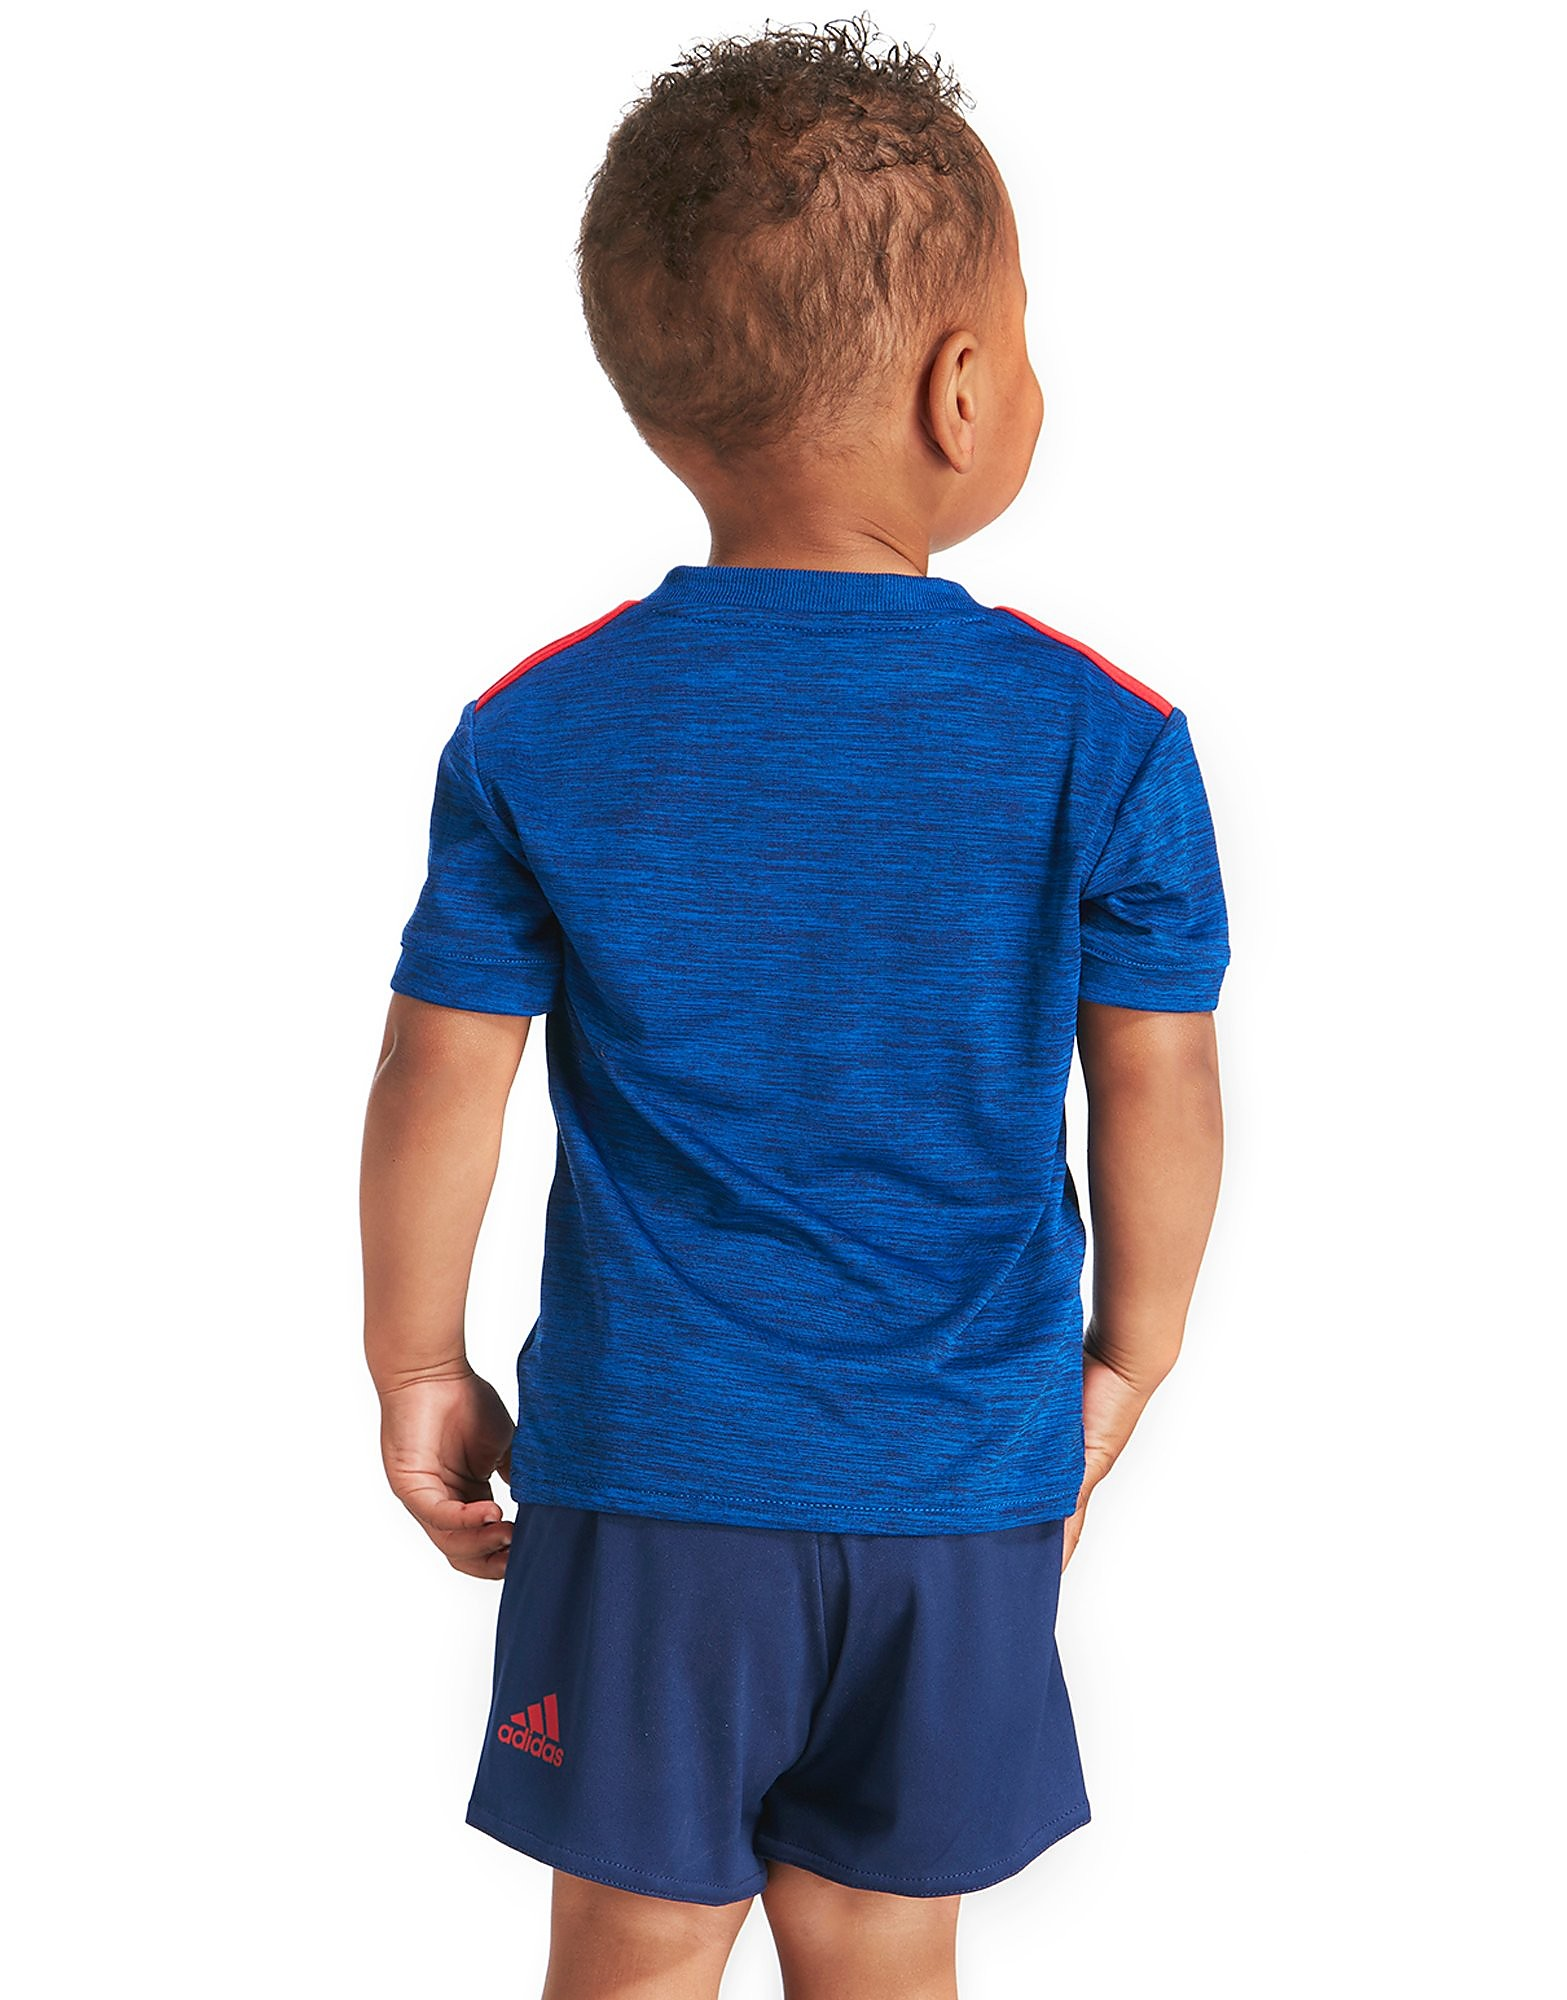 adidas Manchester United 2016/17 Away Kit Infant